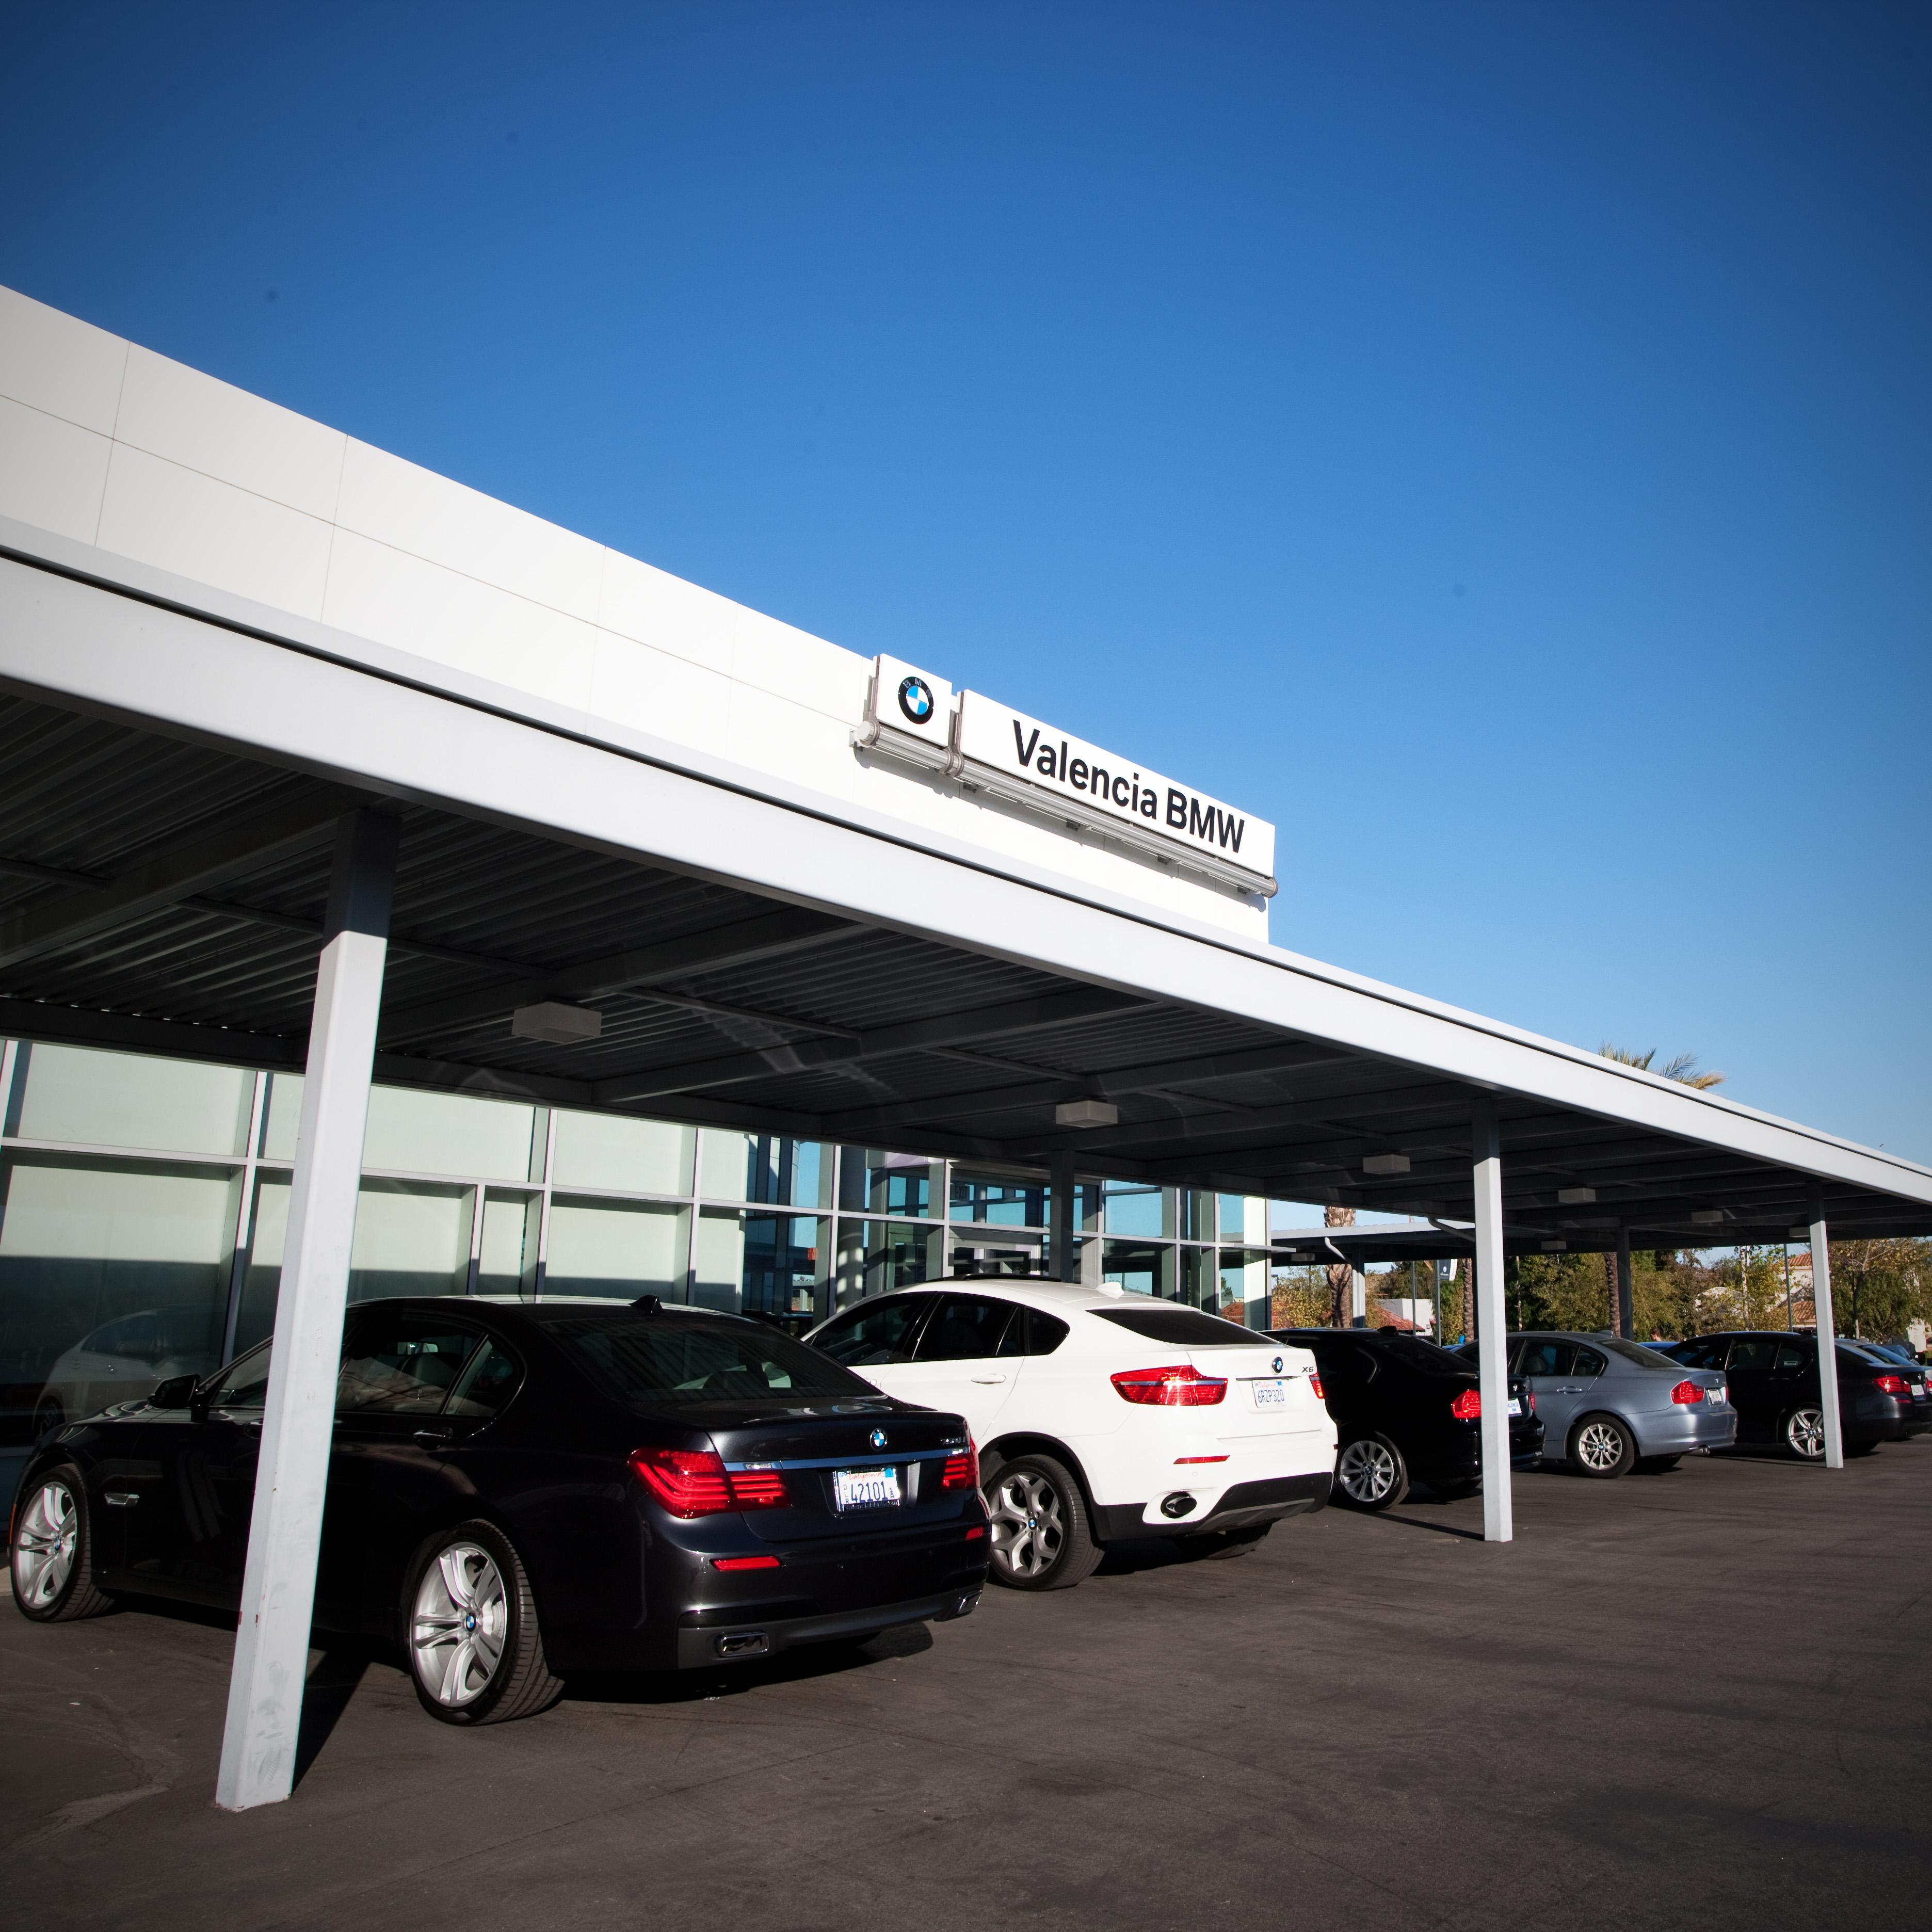 Valencia BMW at 23435 Valencia Boulevard, Valencia, CA on Fave